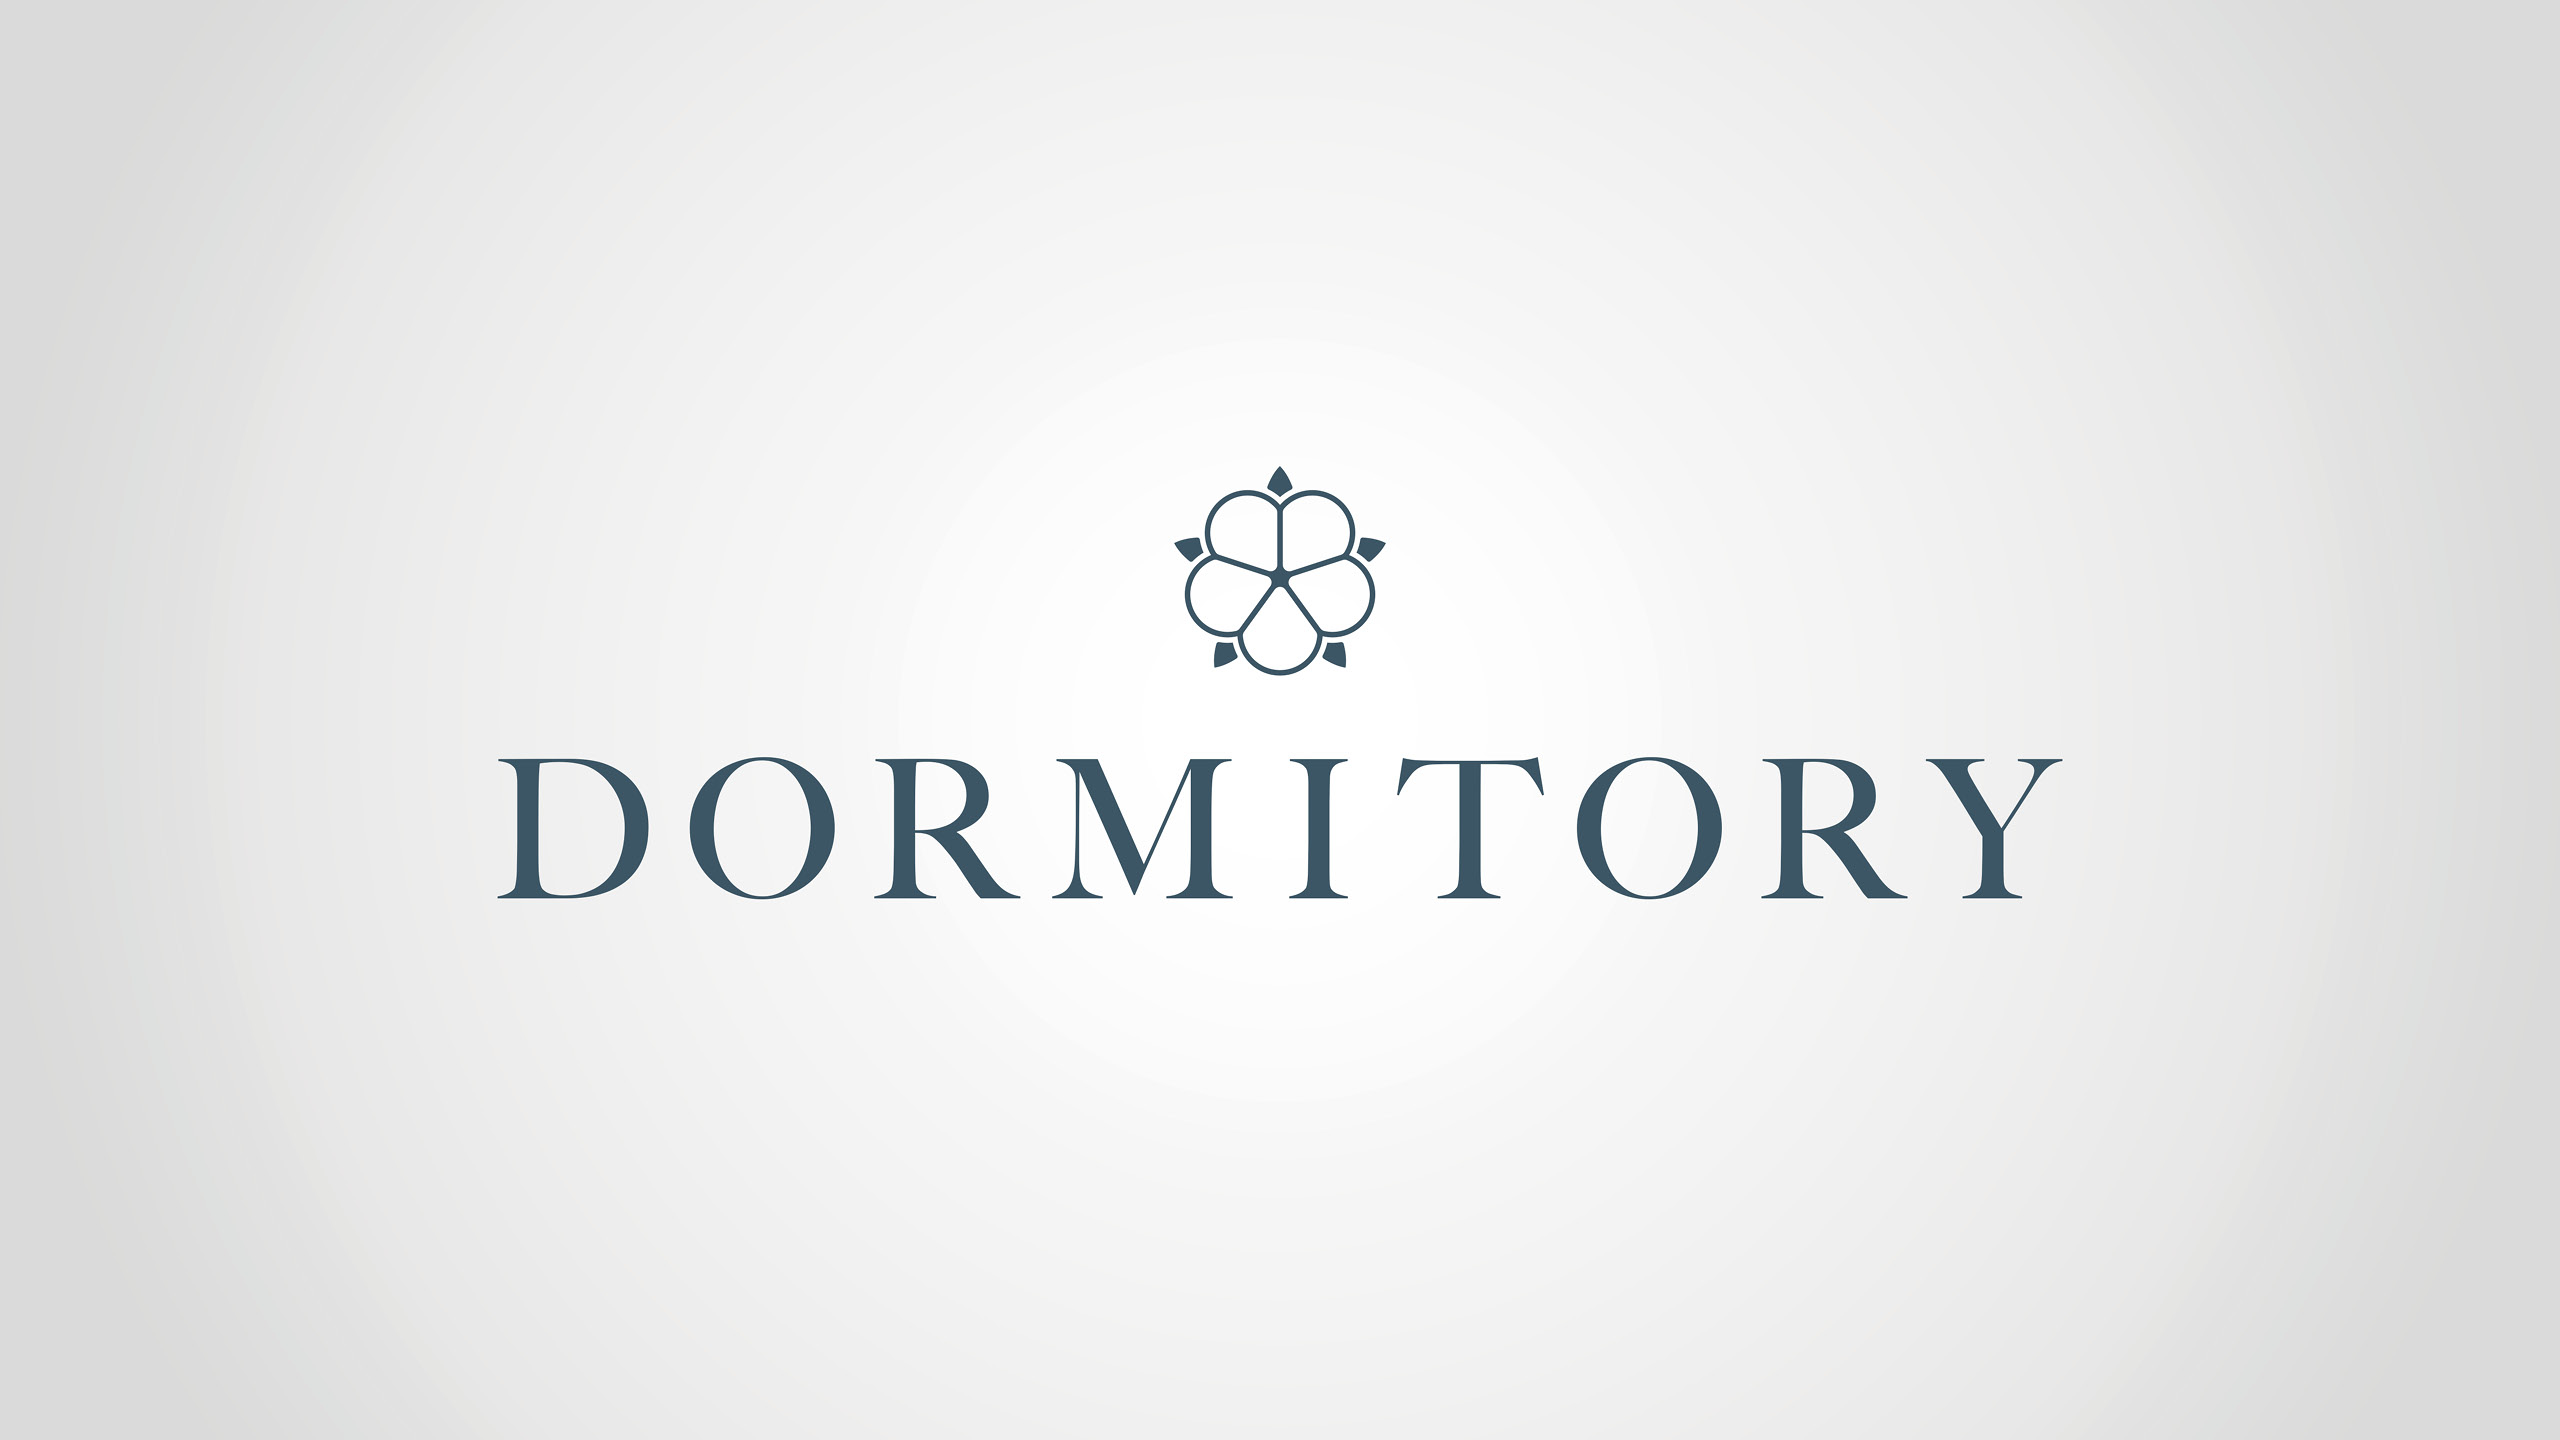 Dormitory Logo